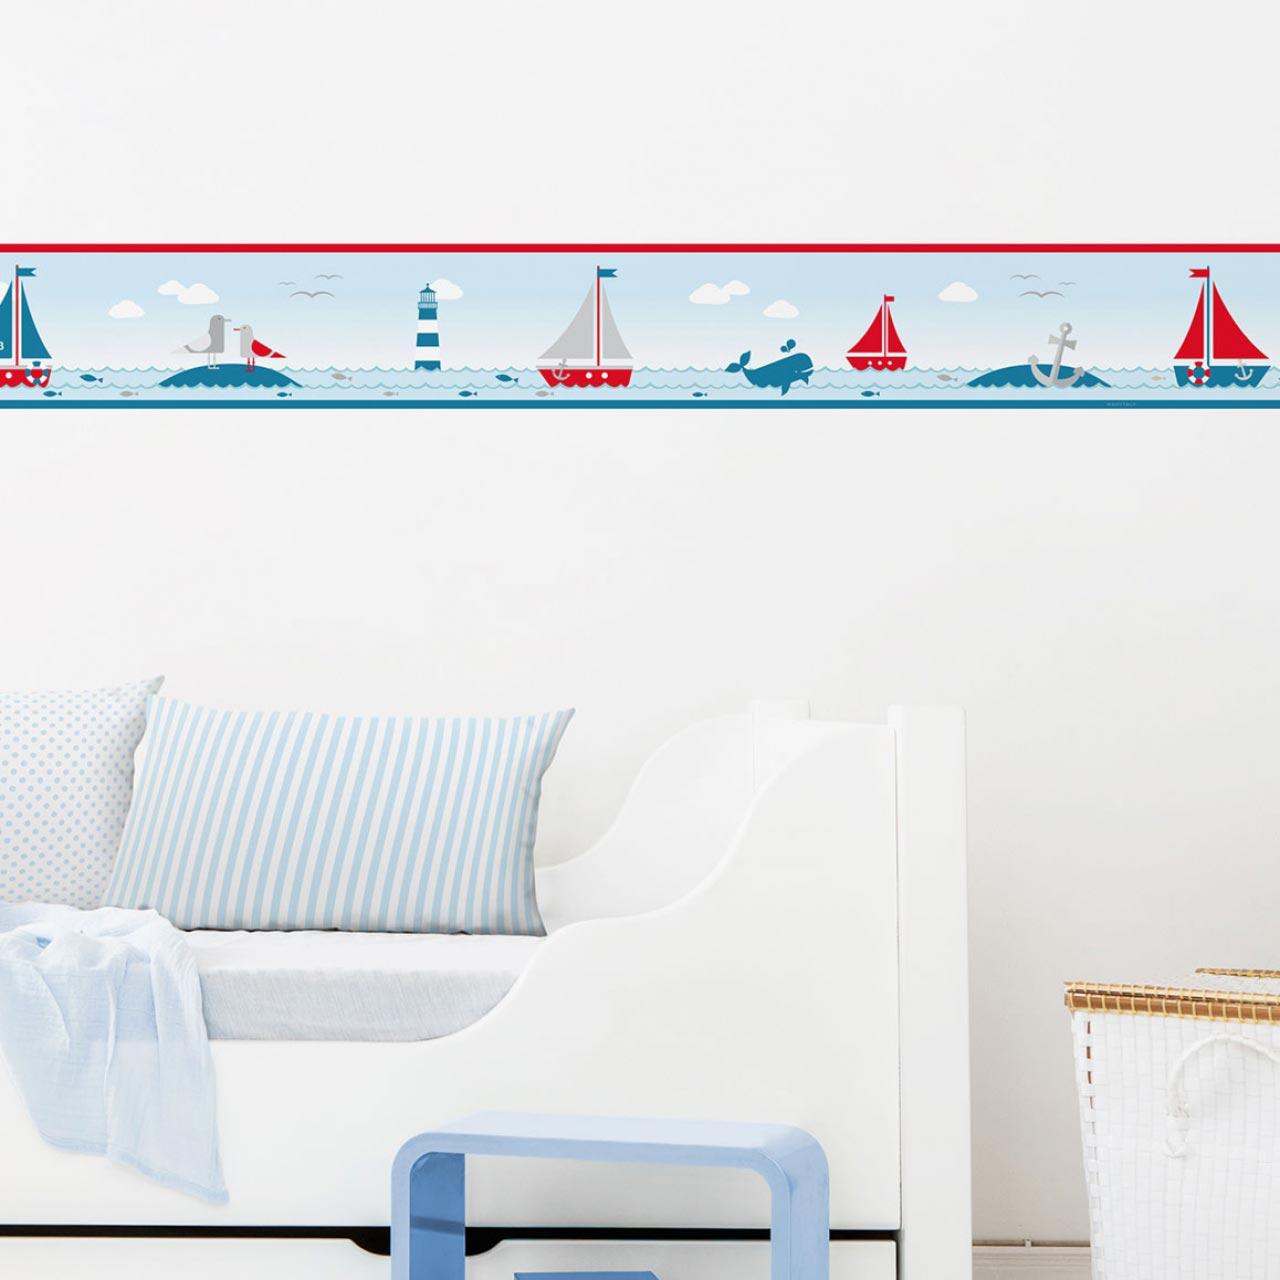 Bordüre im maritimen Design mit Leuchtturm, Sailing Red